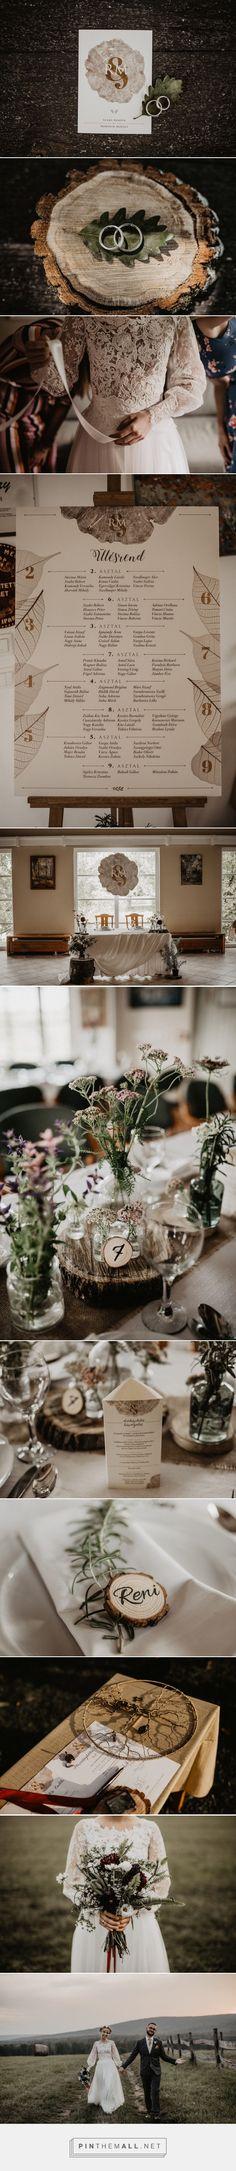 R&M Wedding Graphic Designs on Behance by Floresk Design / Virág Veszteg Photos: All That Makes You Happy